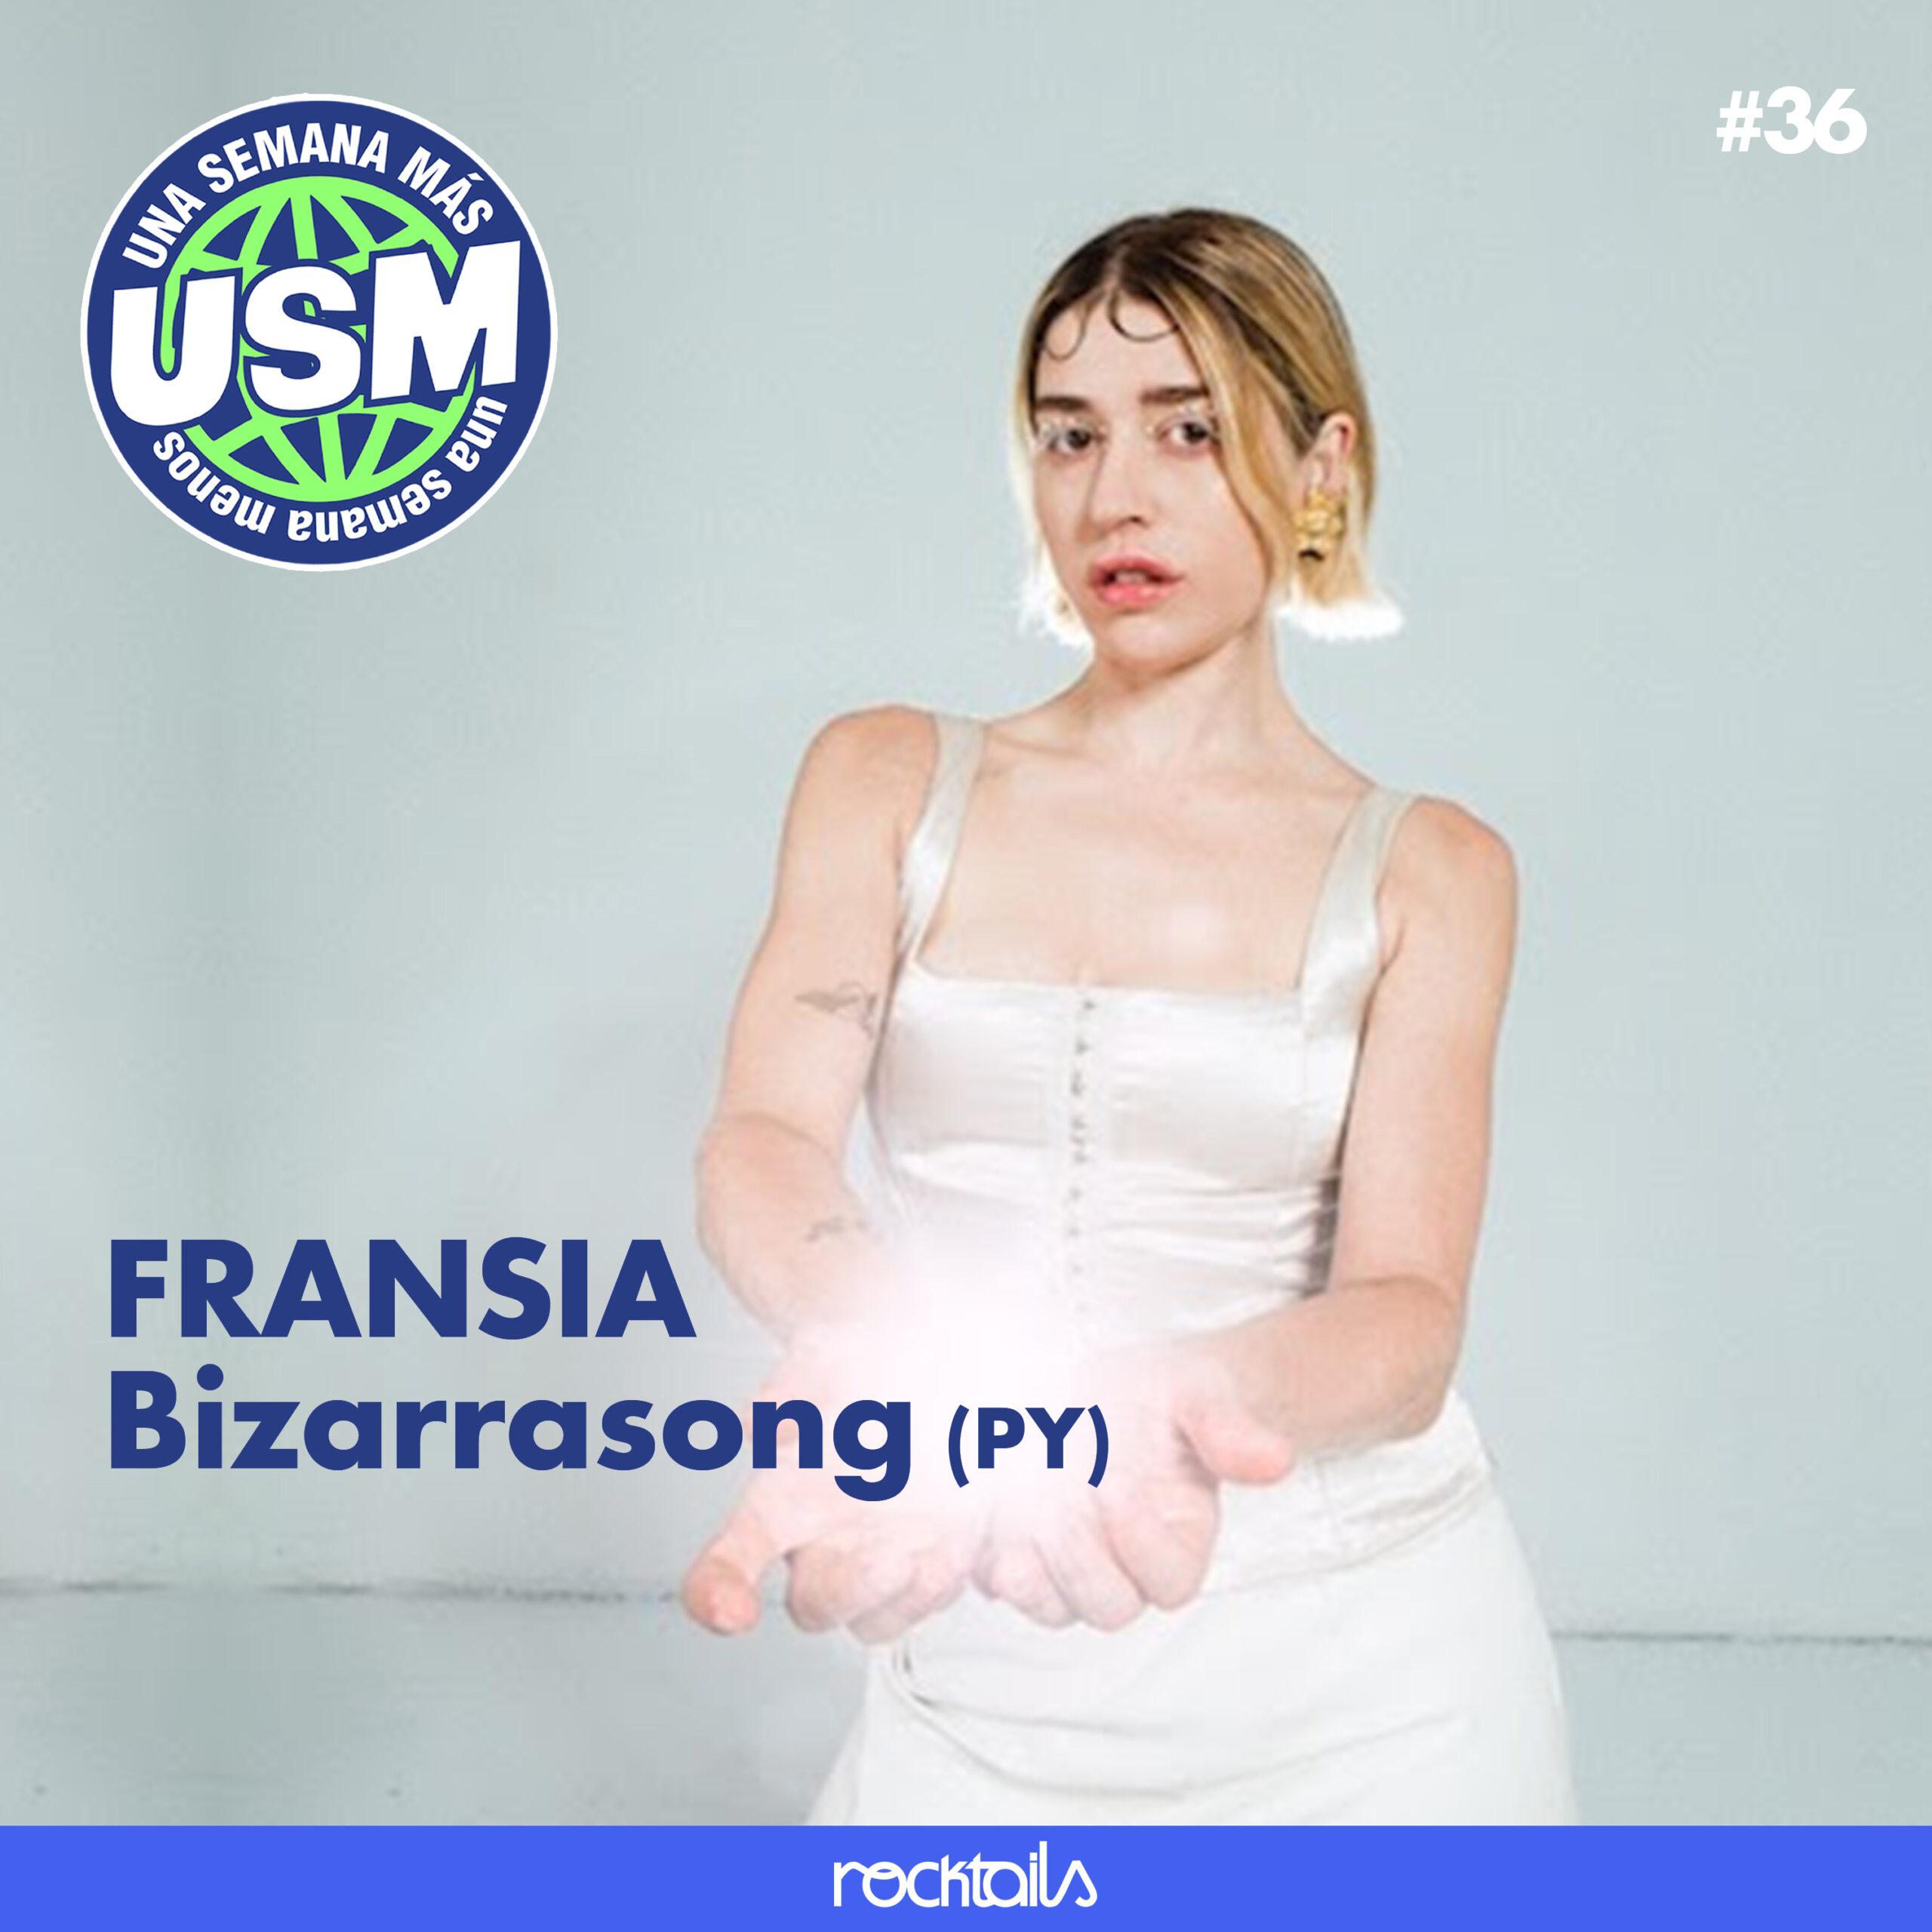 fransia